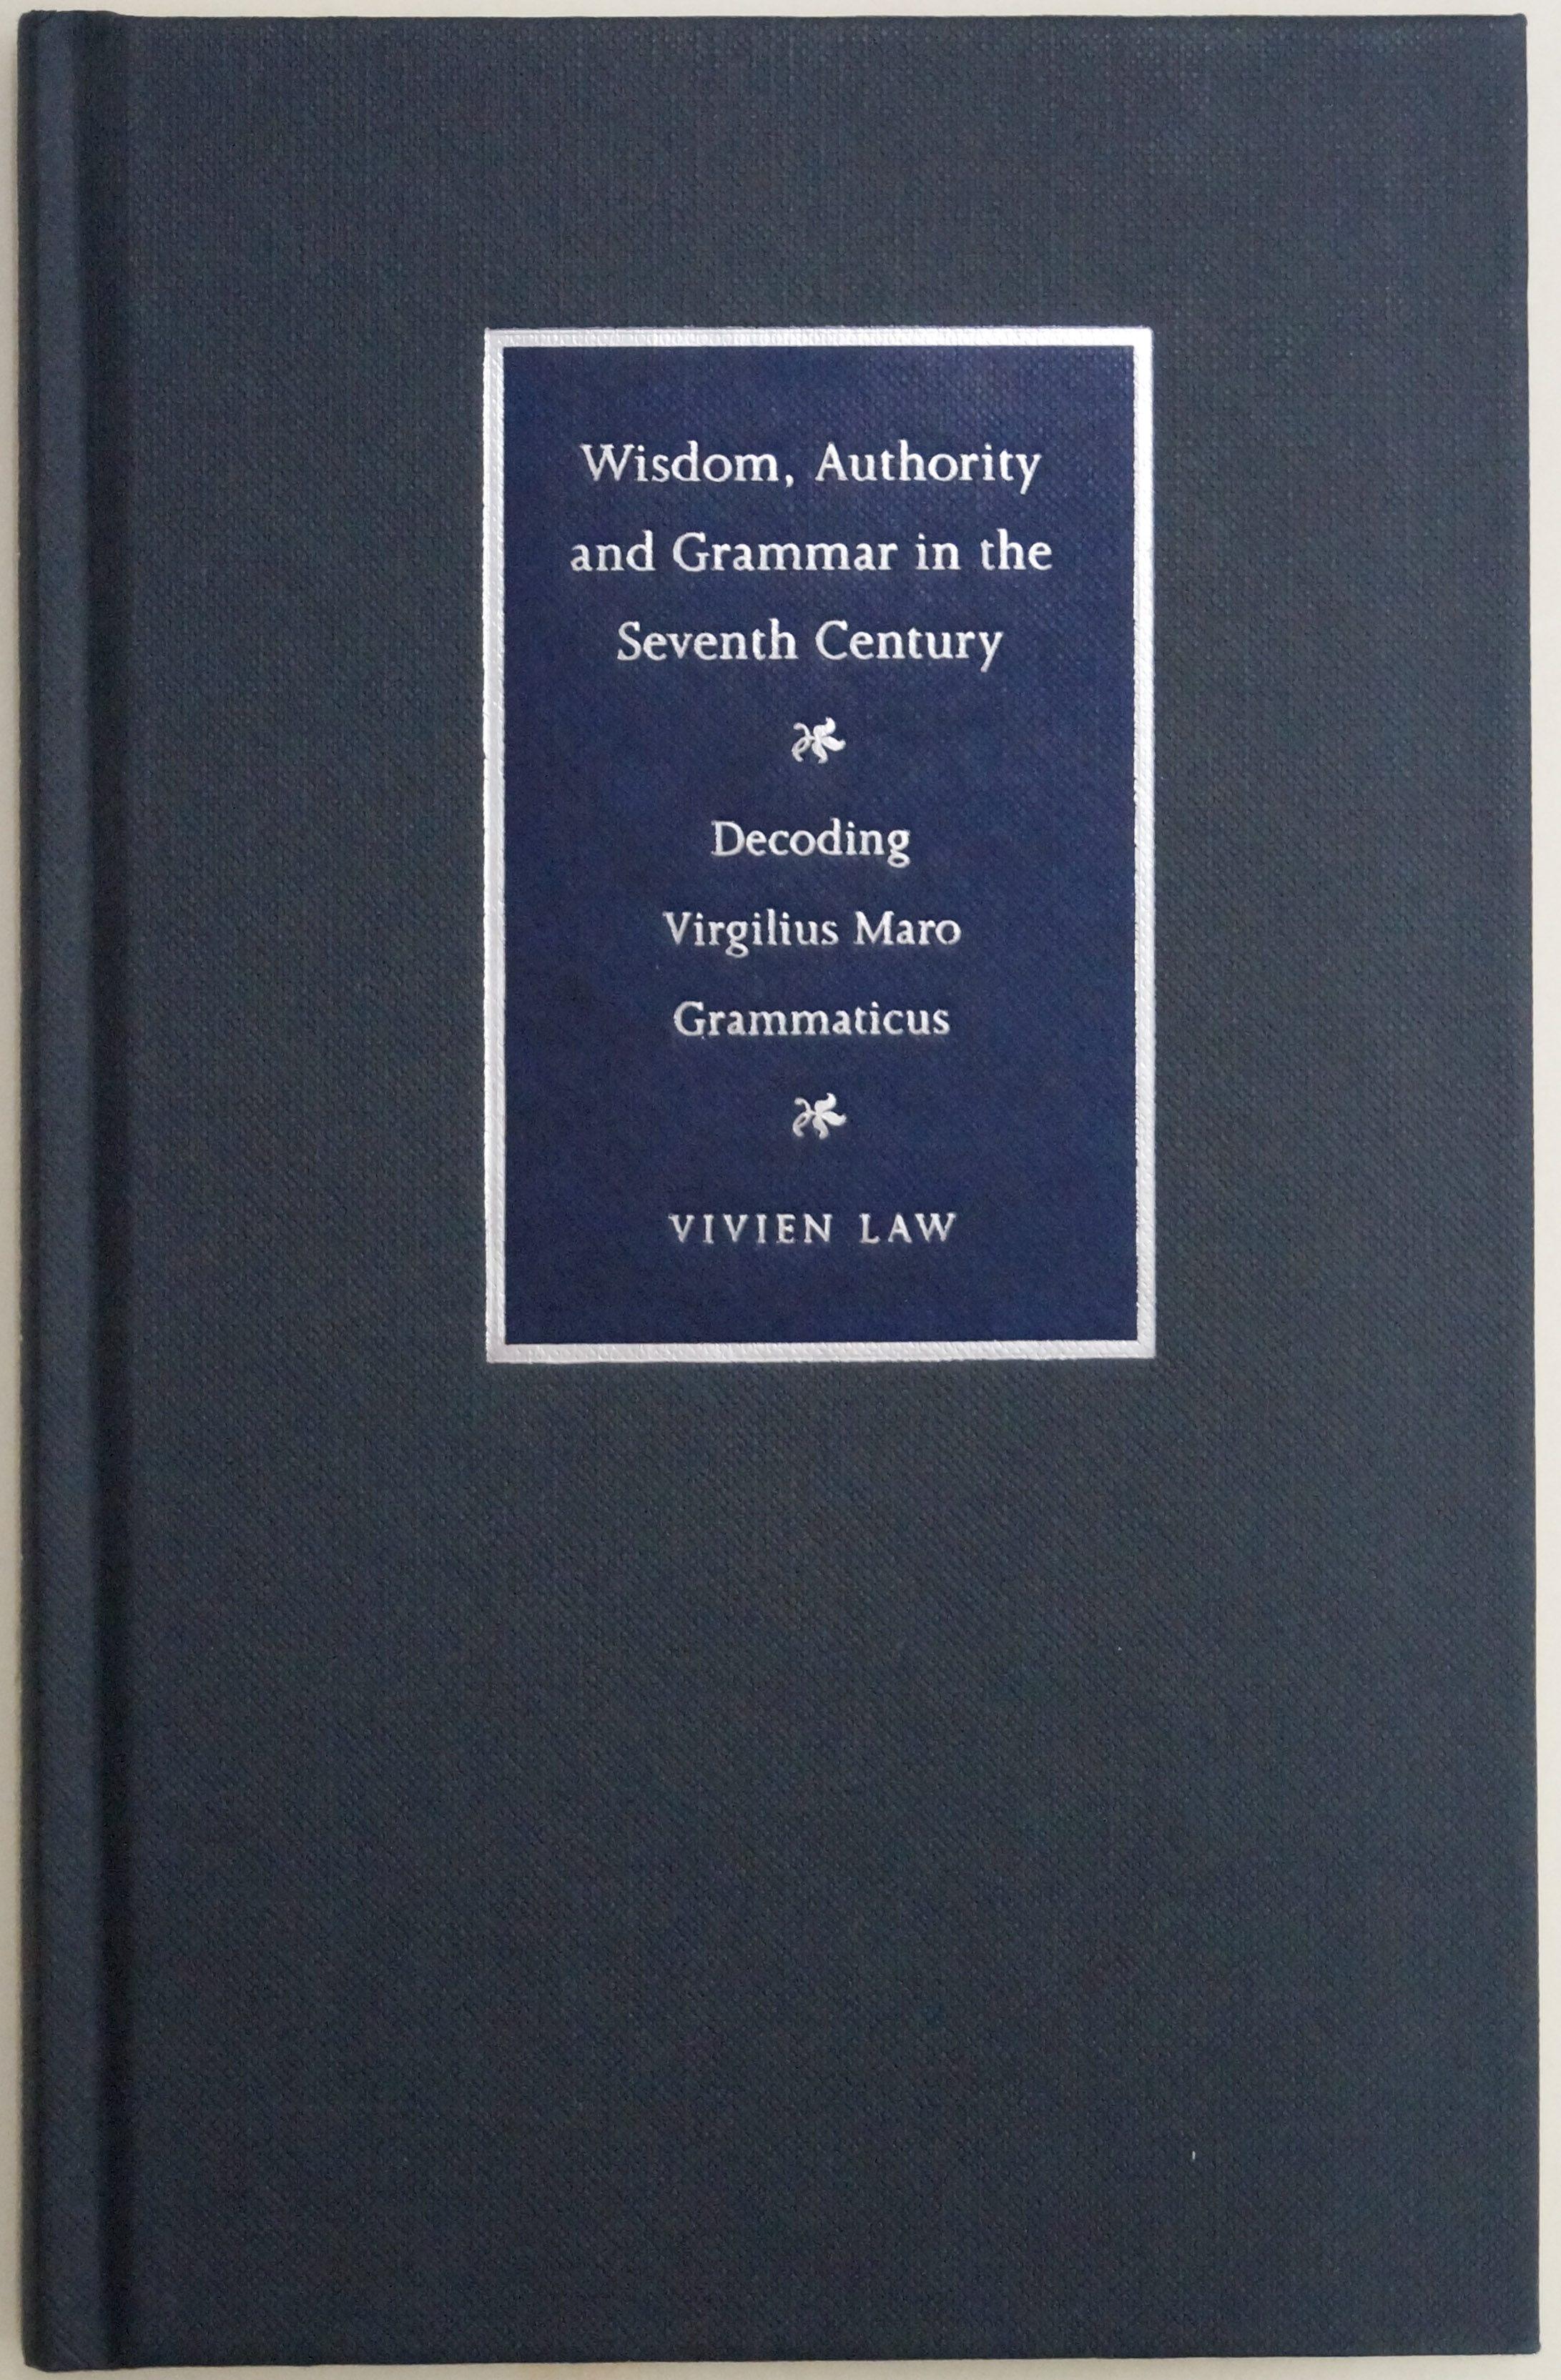 VIRGILIUS MARO GRAMMATICUS, LAW, V. - Wisdom, authority and grammar in the seventh century. Decoding Virgilius Maro Grammaticus.